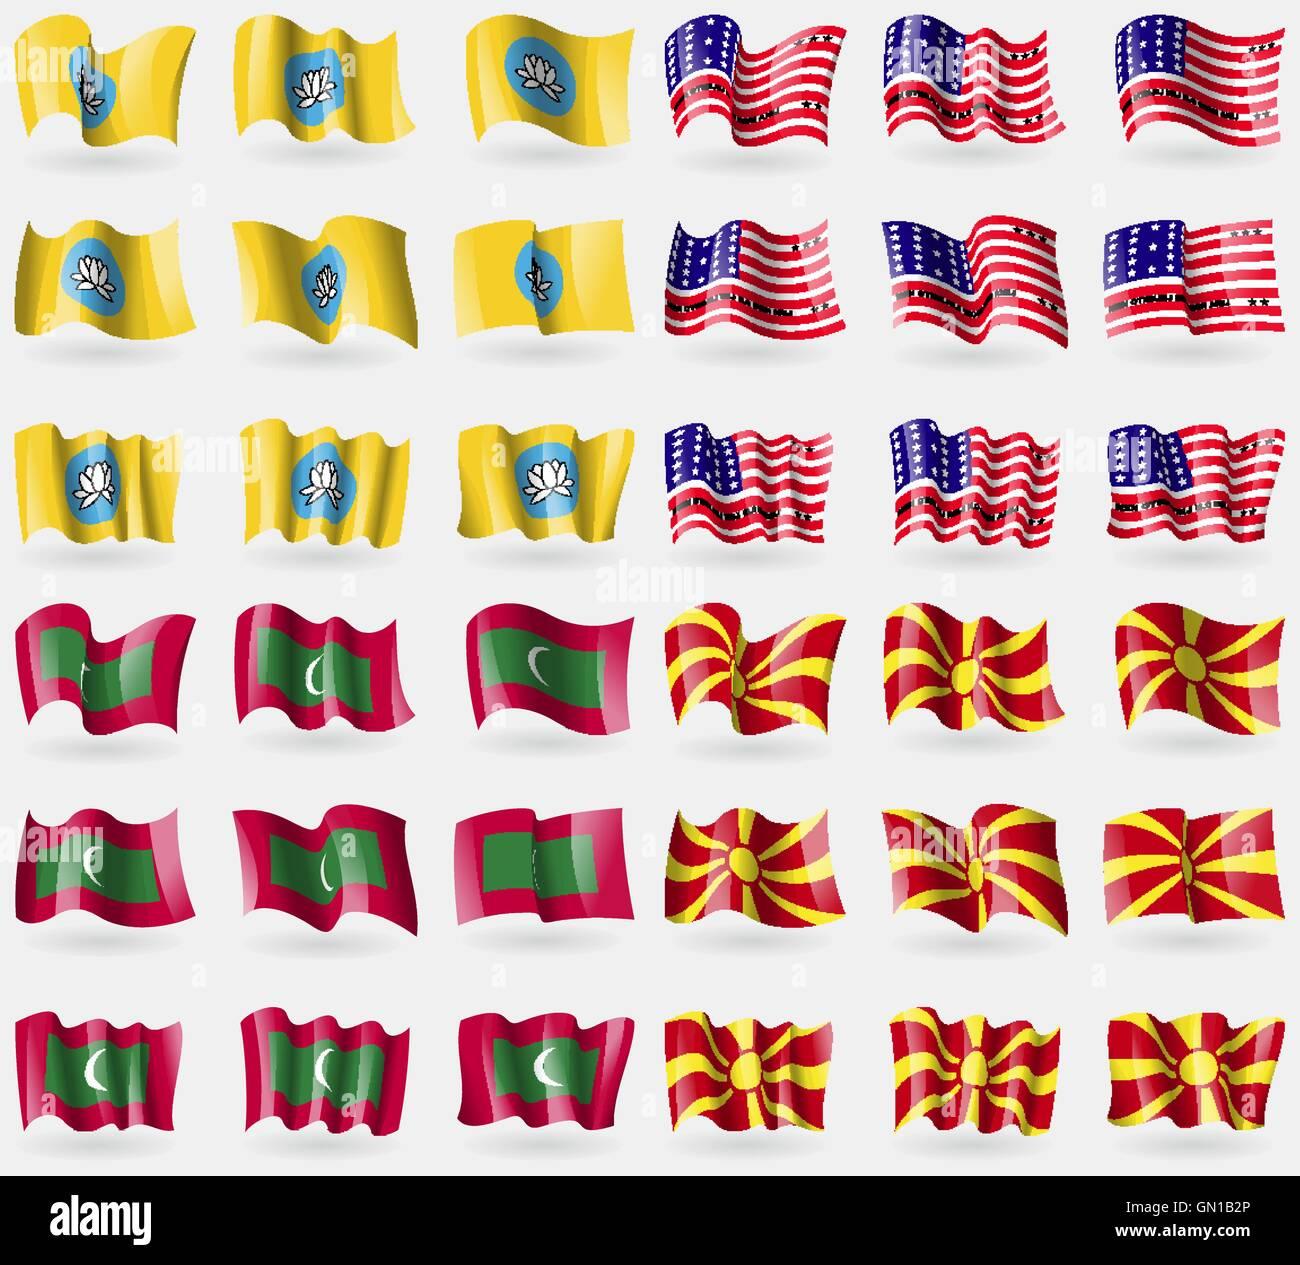 Kalmykia, Bikini Atoll, Maldives, Macedonia. Set of 36 flags of the countries of the world. Vector - Stock Image